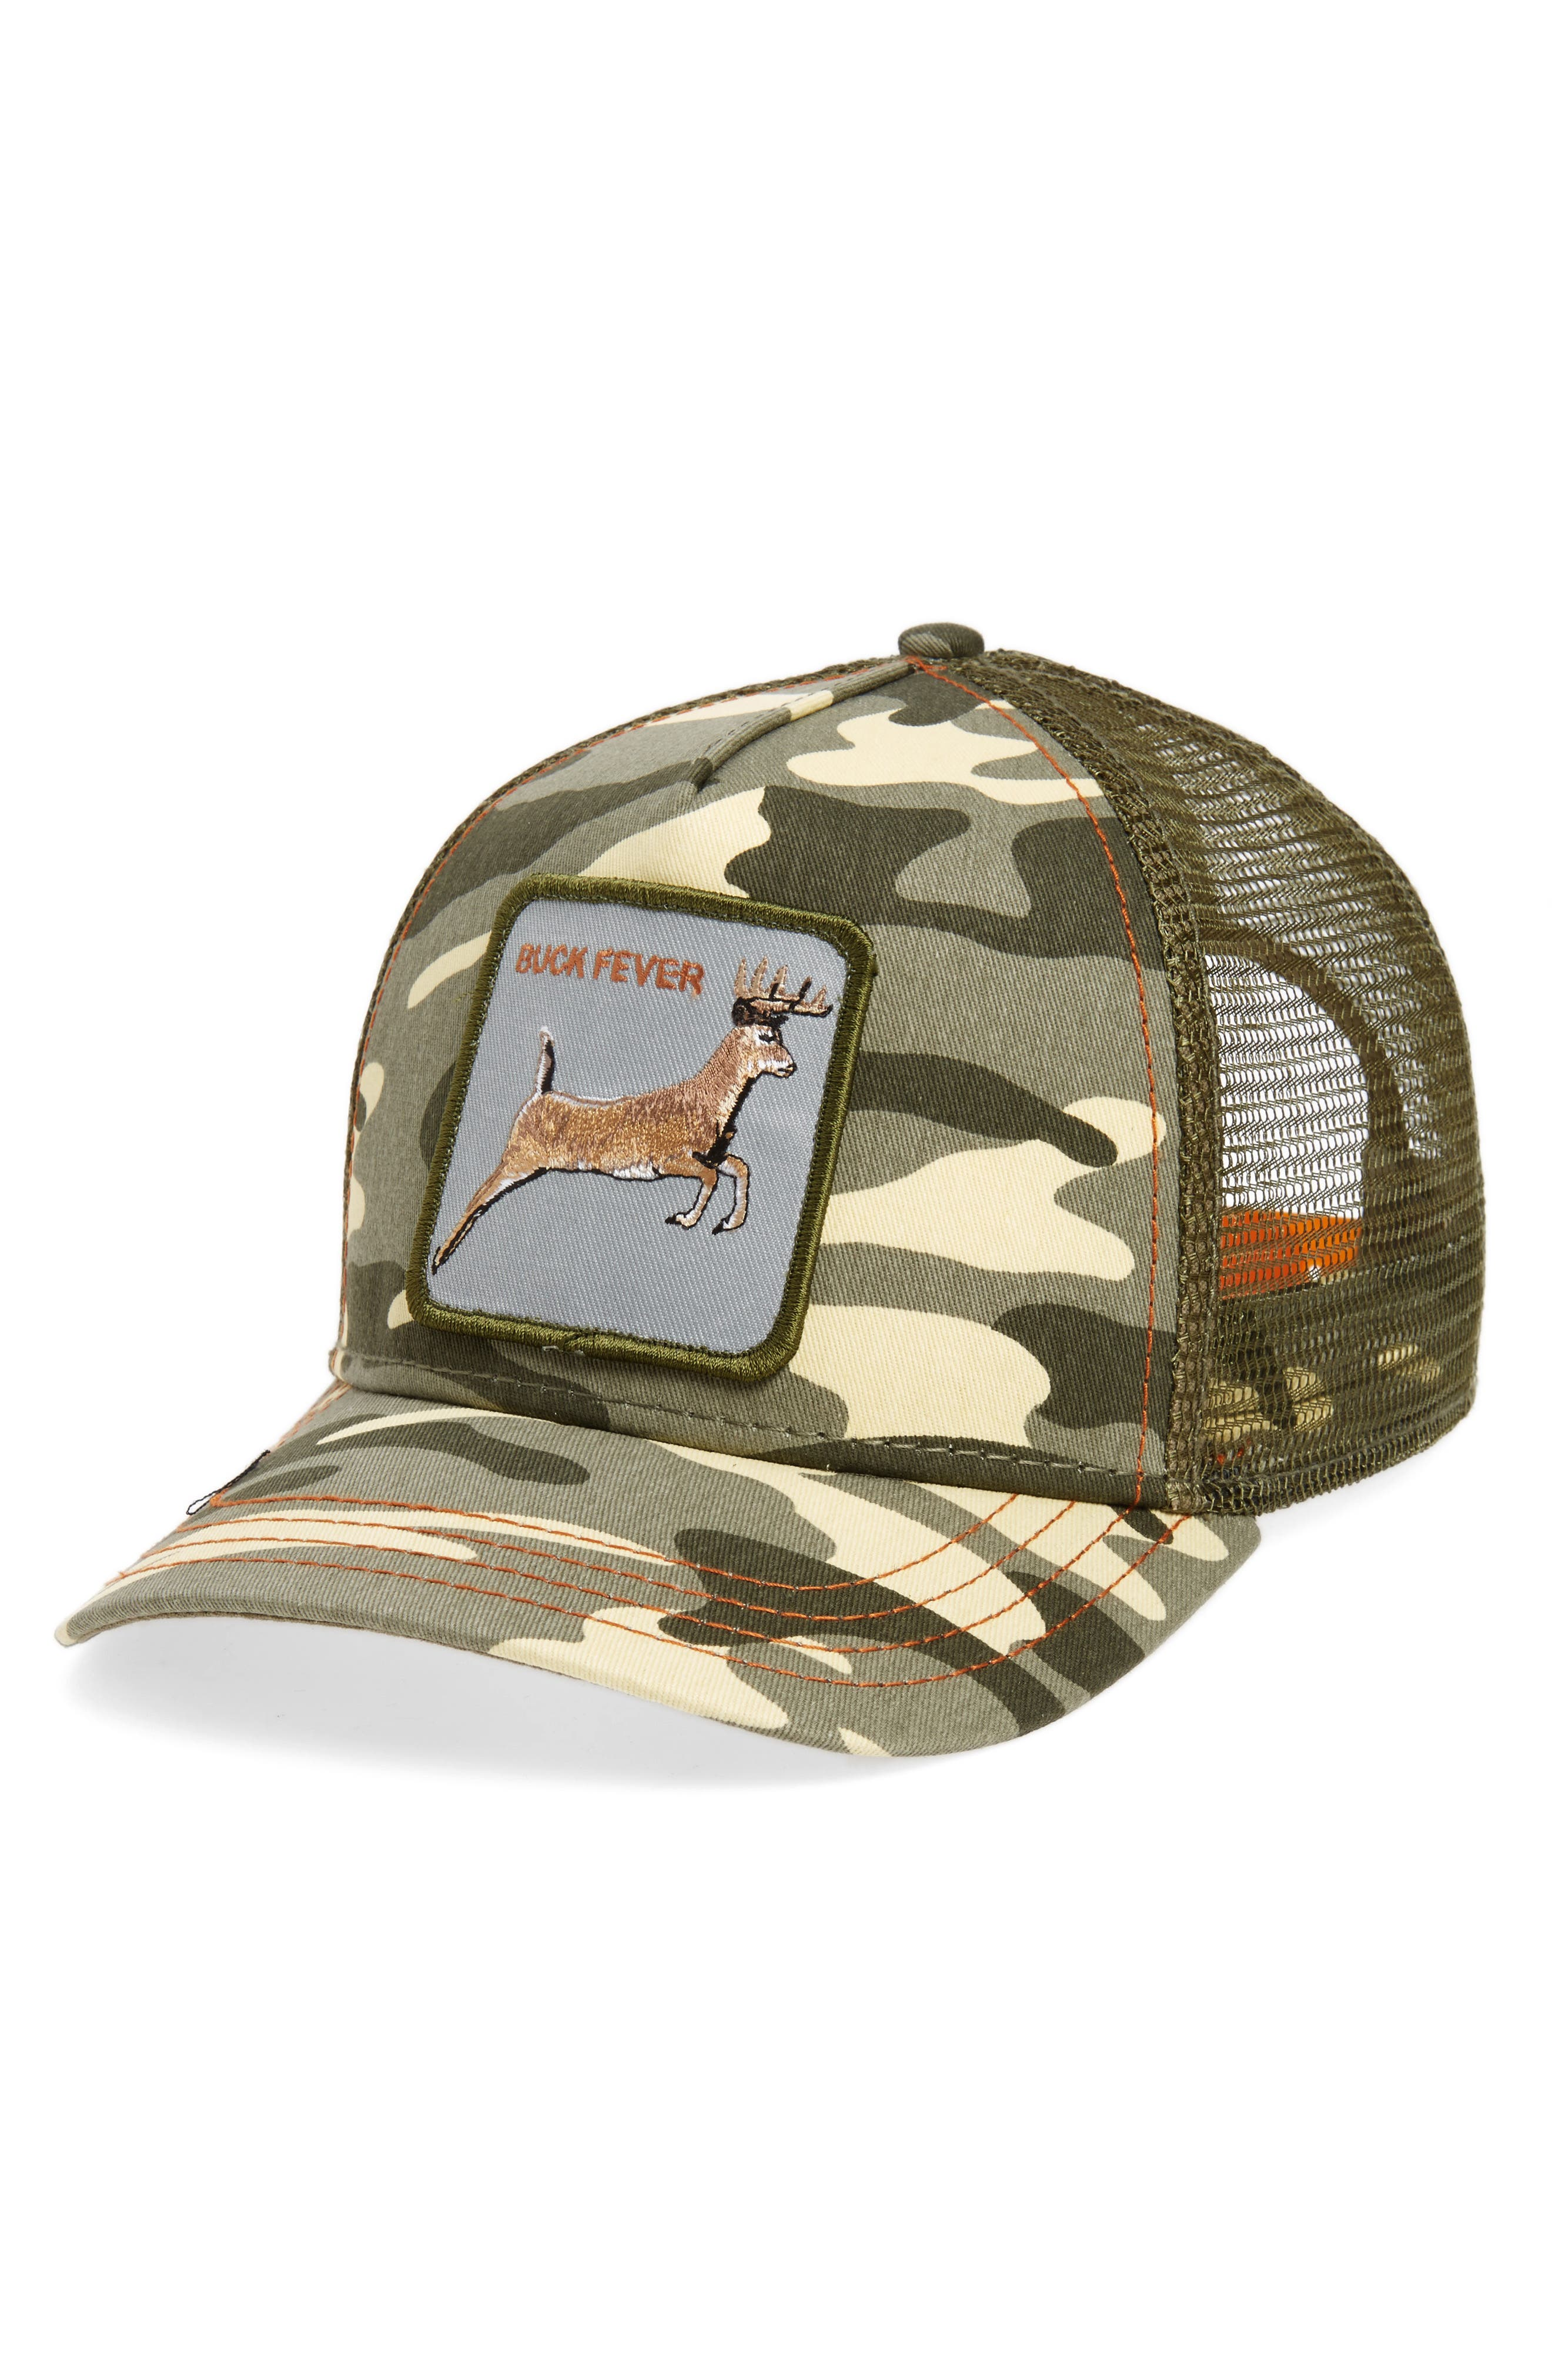 Goorin Brothers 4 Points Trucker Hat